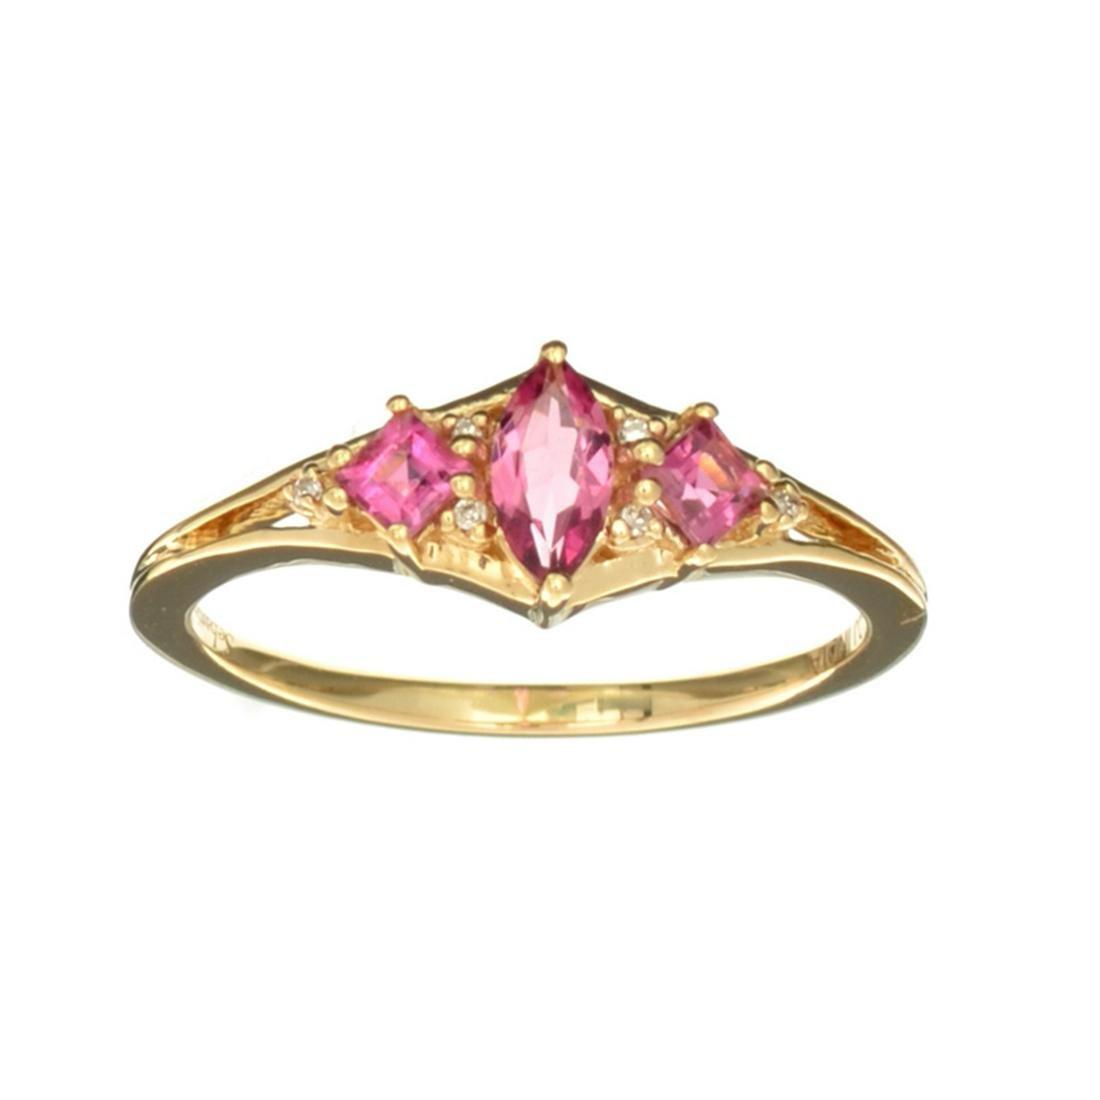 Designer Sebastian 14 KT Gold, Marquise Cut Tourmaline